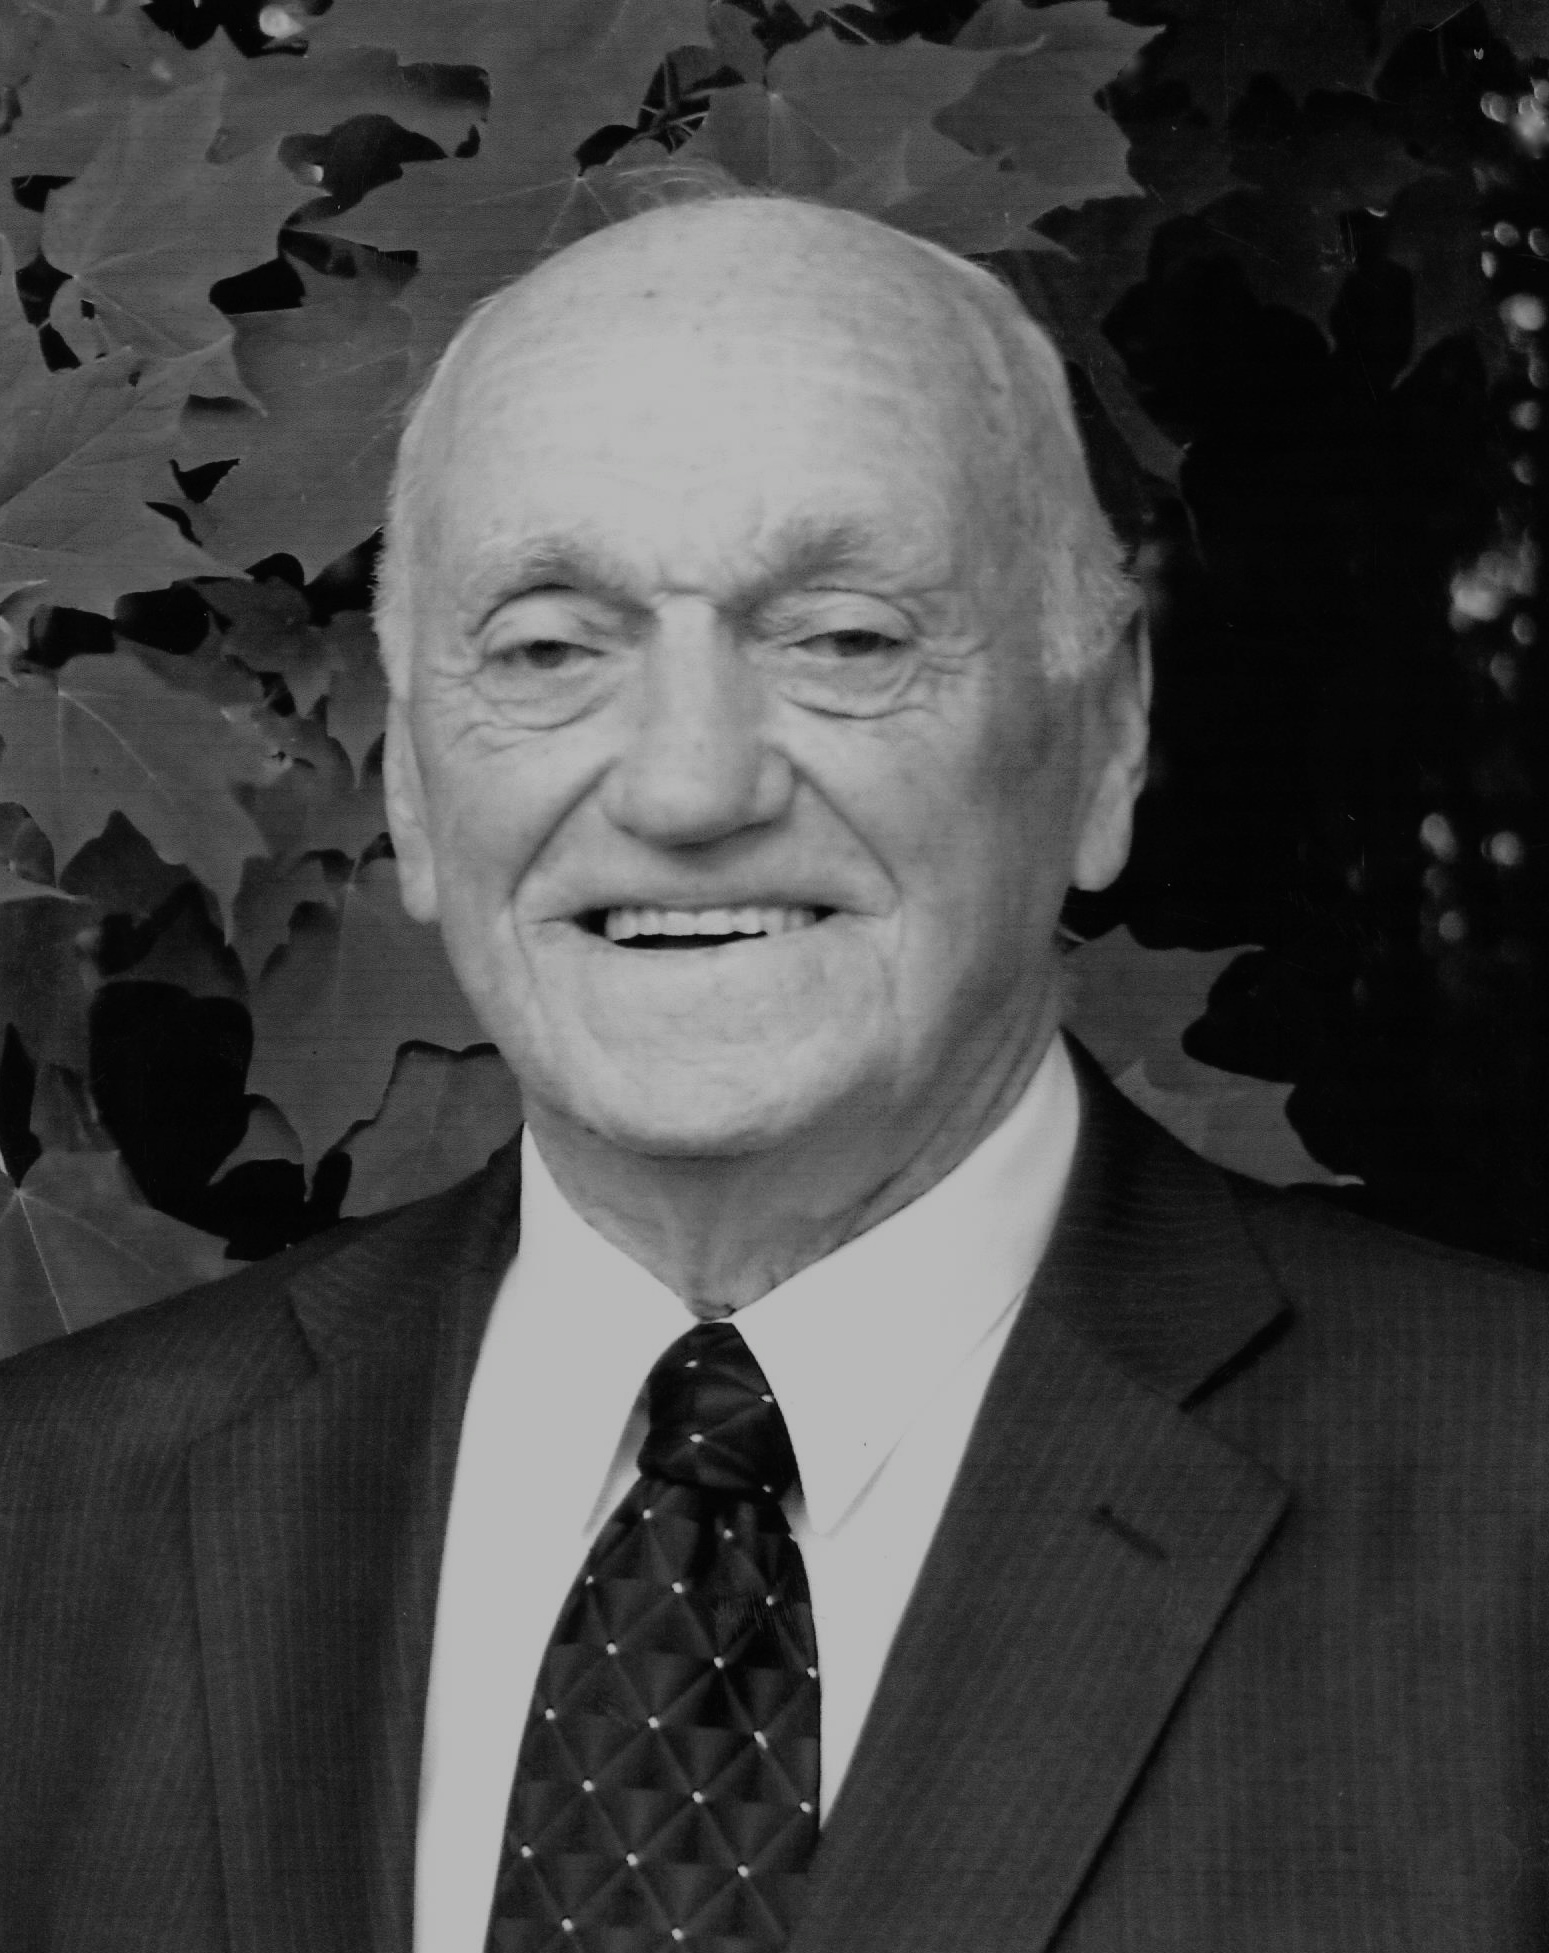 Harold Edward (Ted) Ray